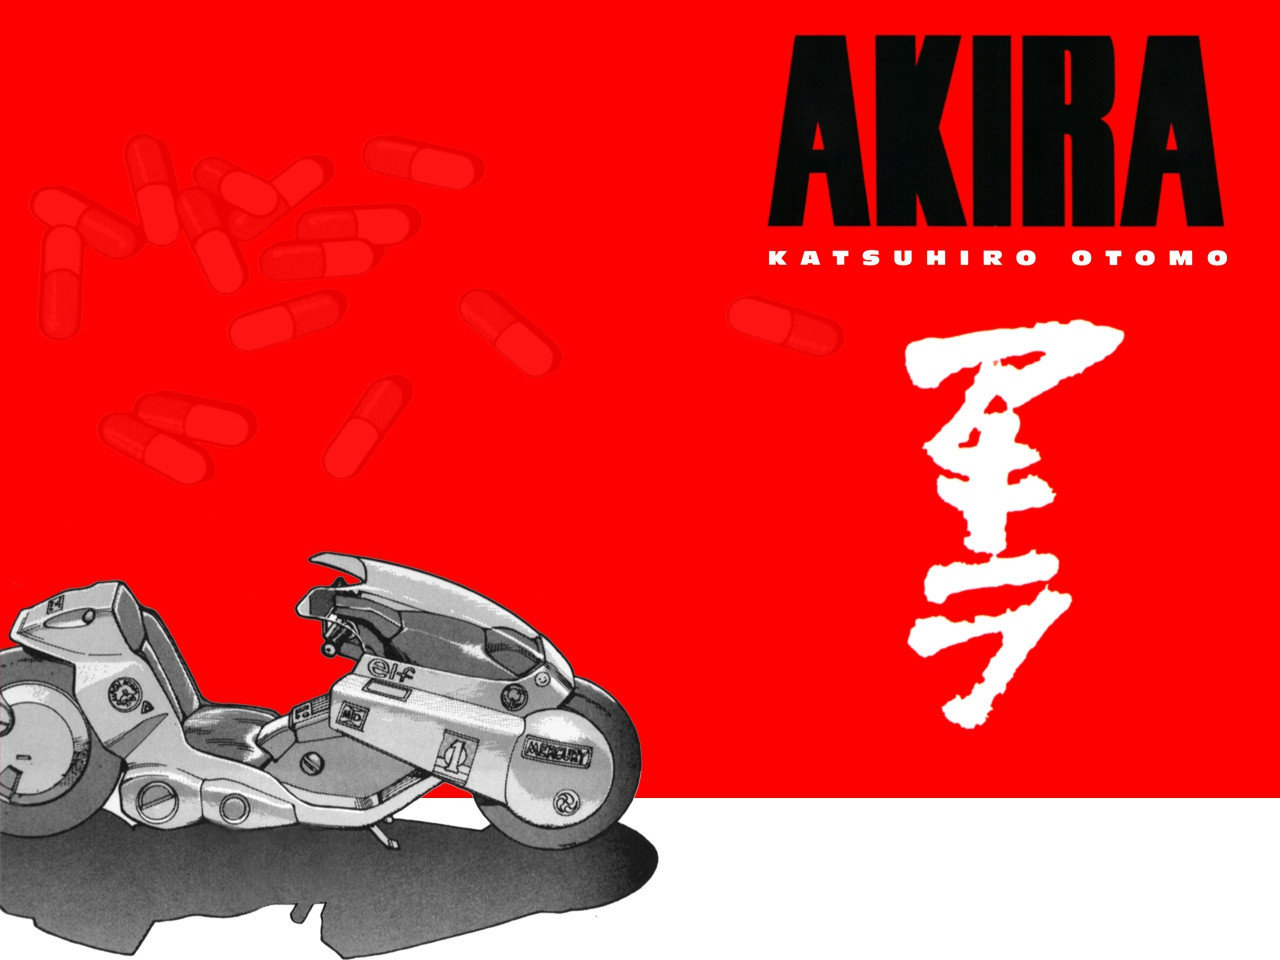 Akira Wallpapers Hd For Desktop Backgrounds